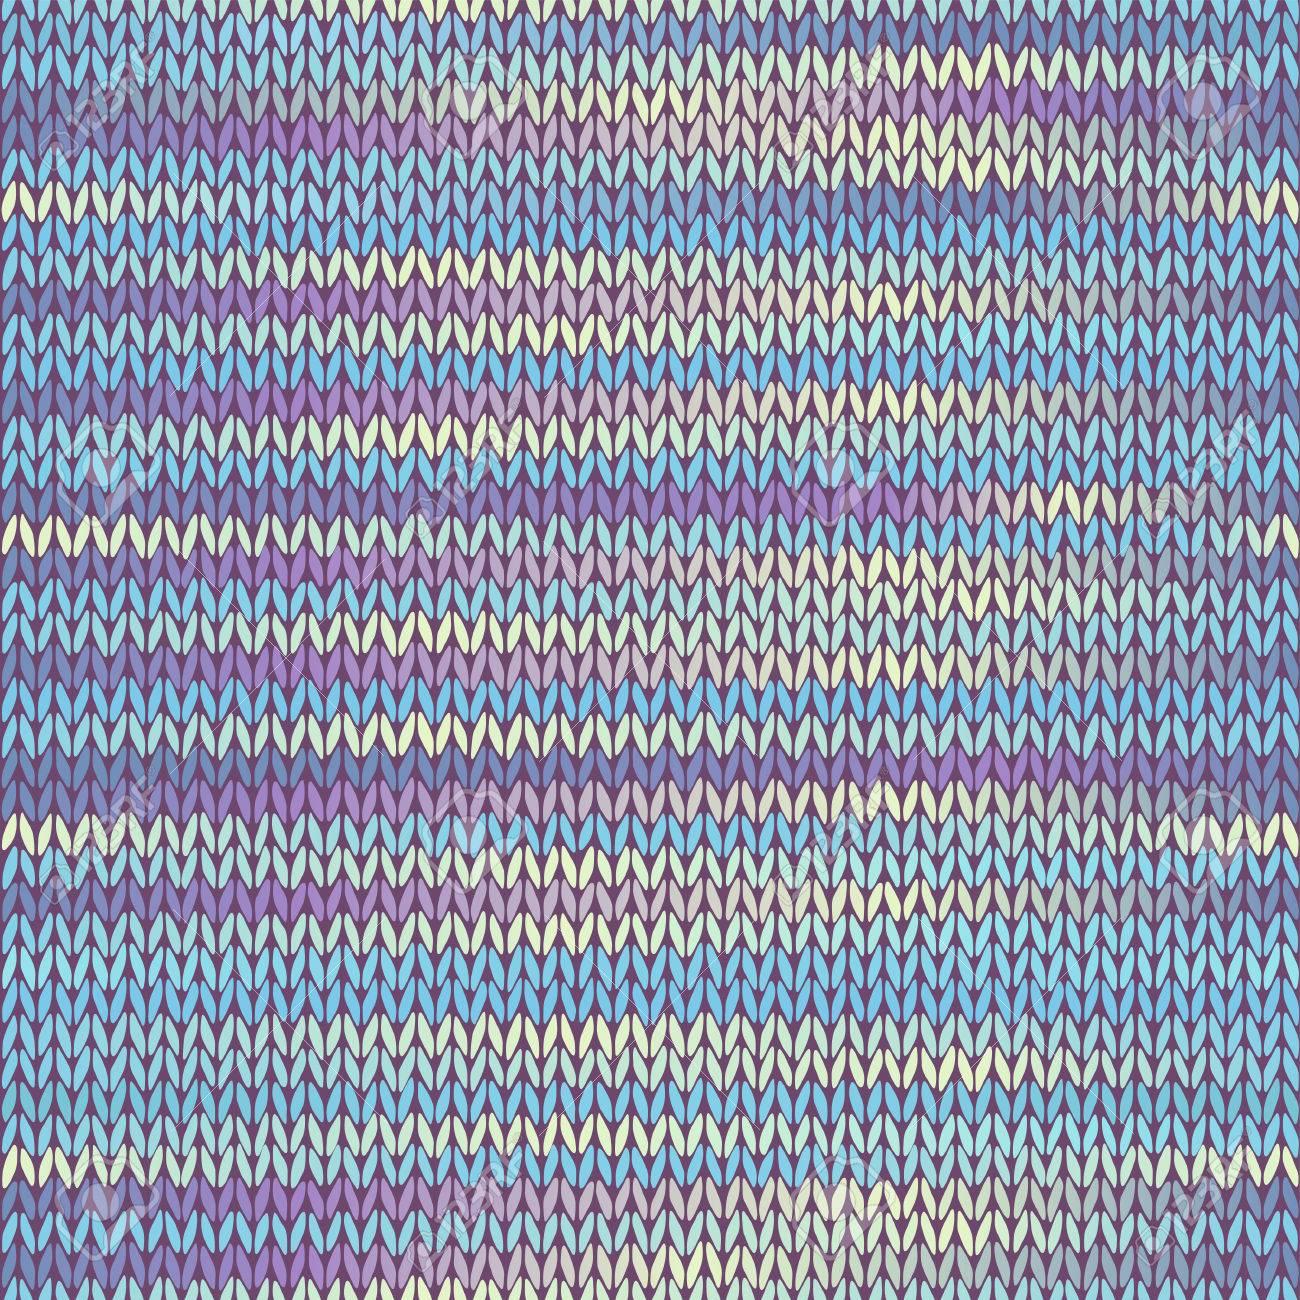 Seamless Tricotee Melange Couleur Rose Bleu Jaune Vector